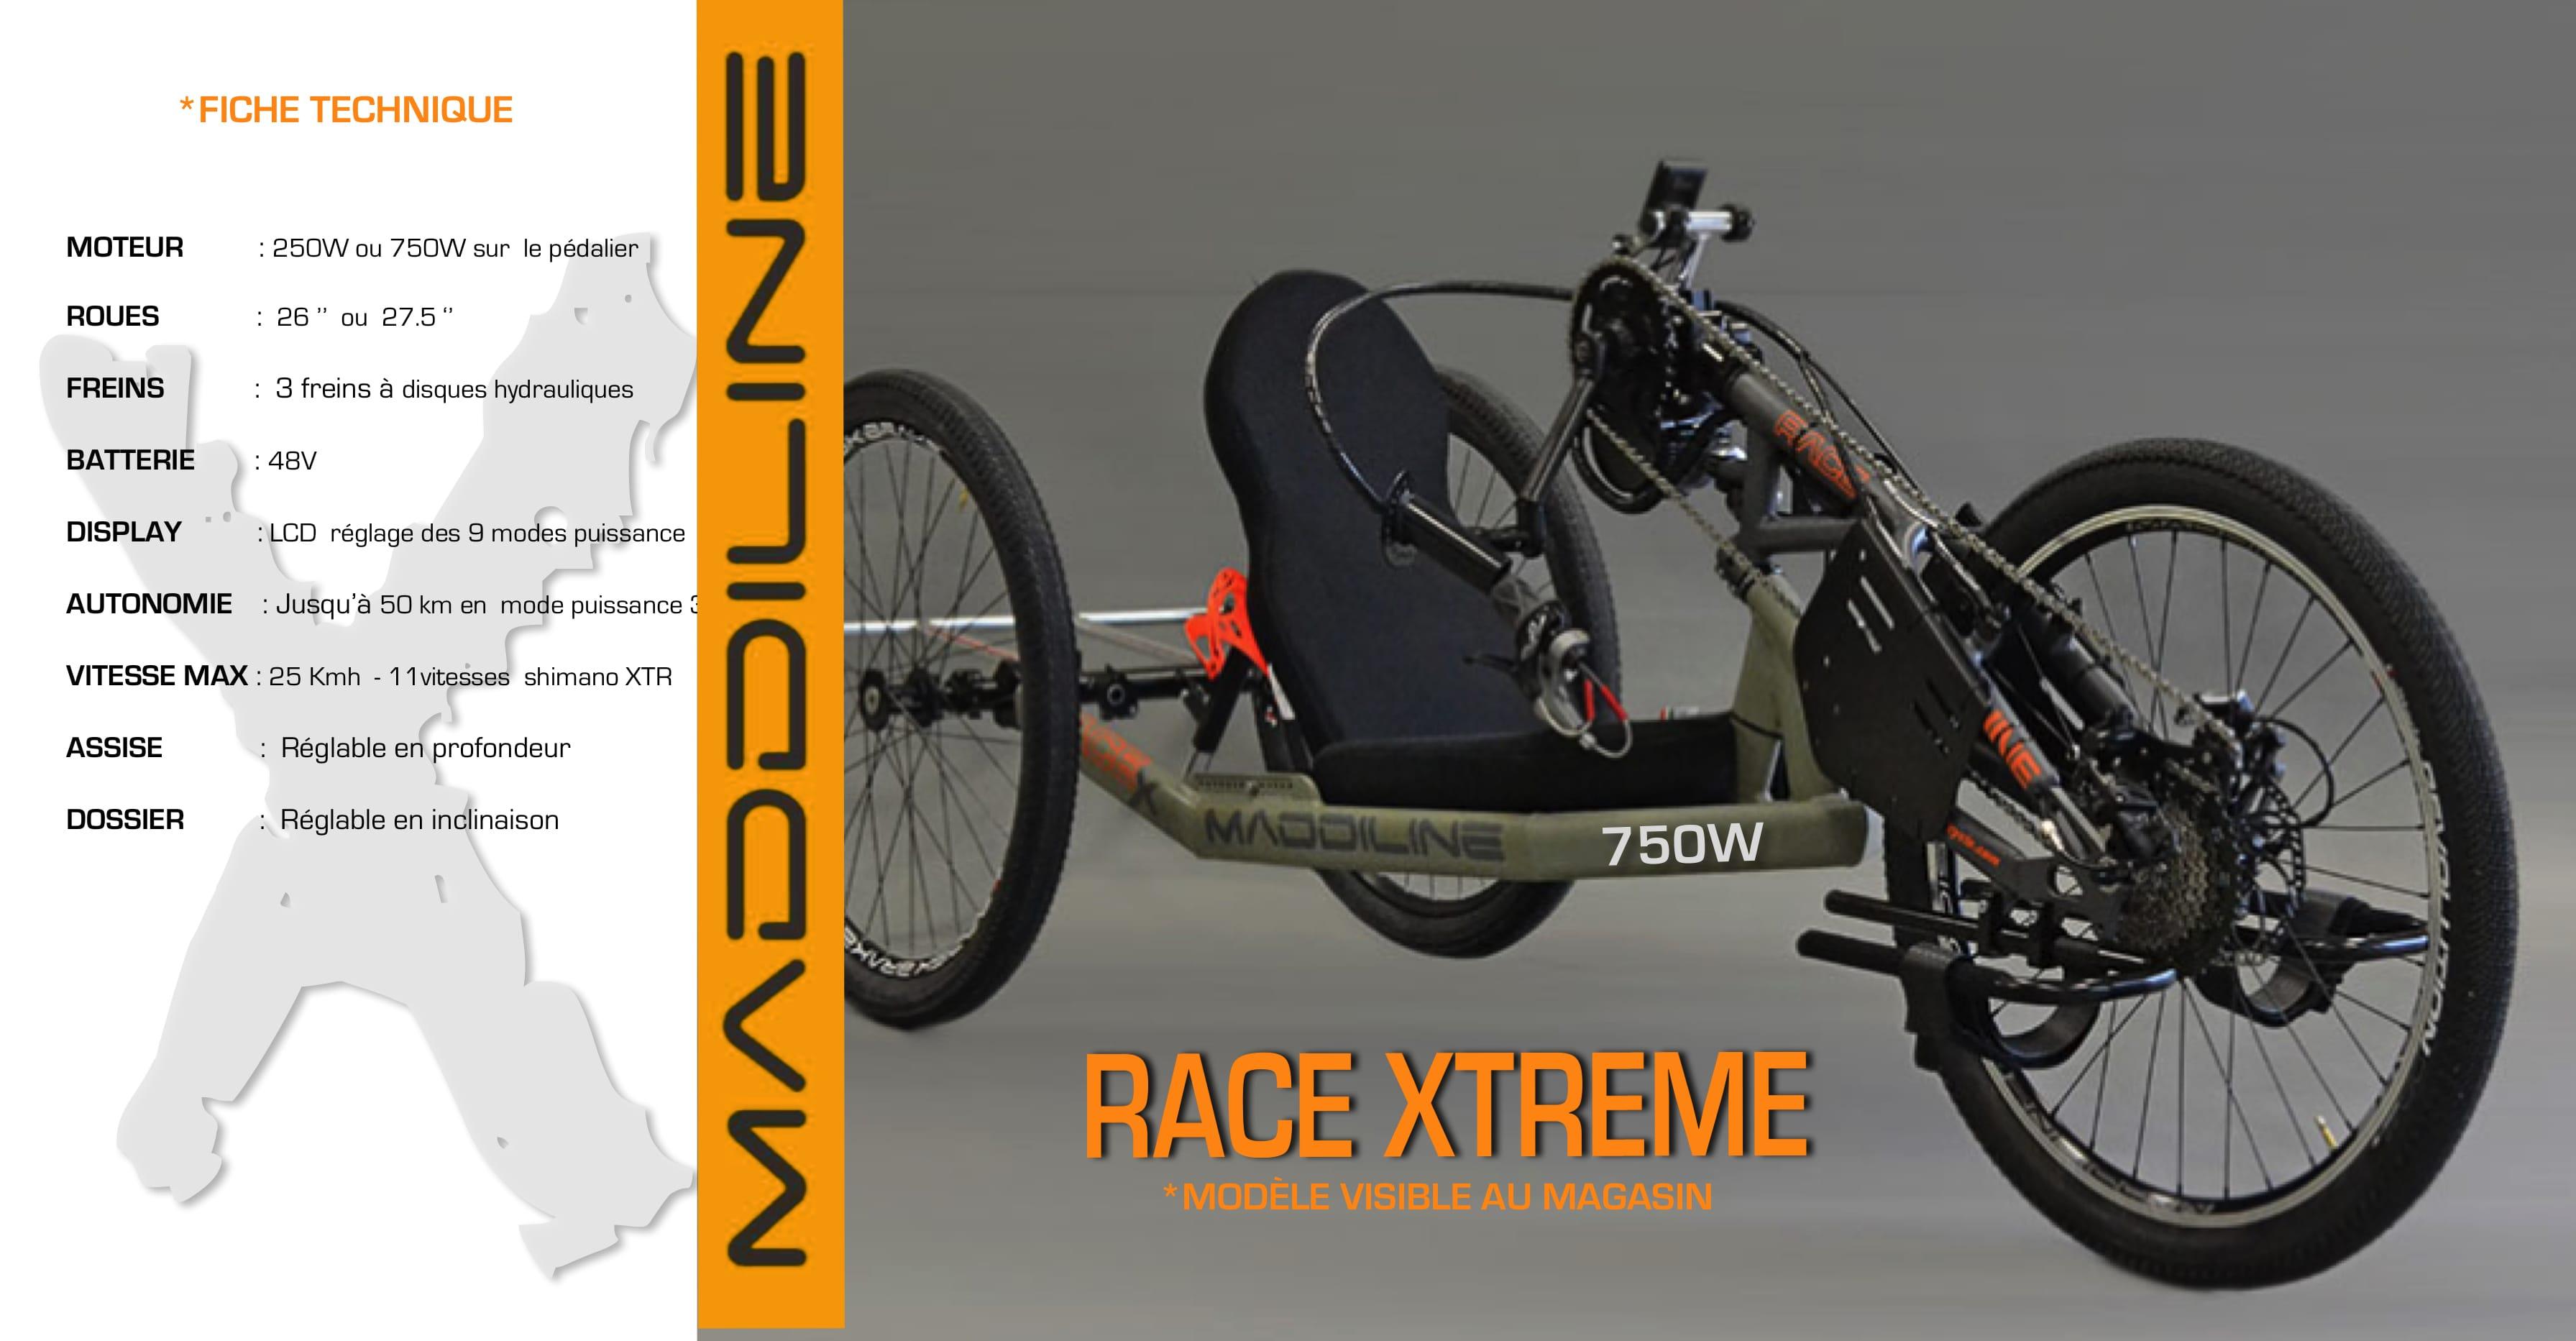 racextreme02